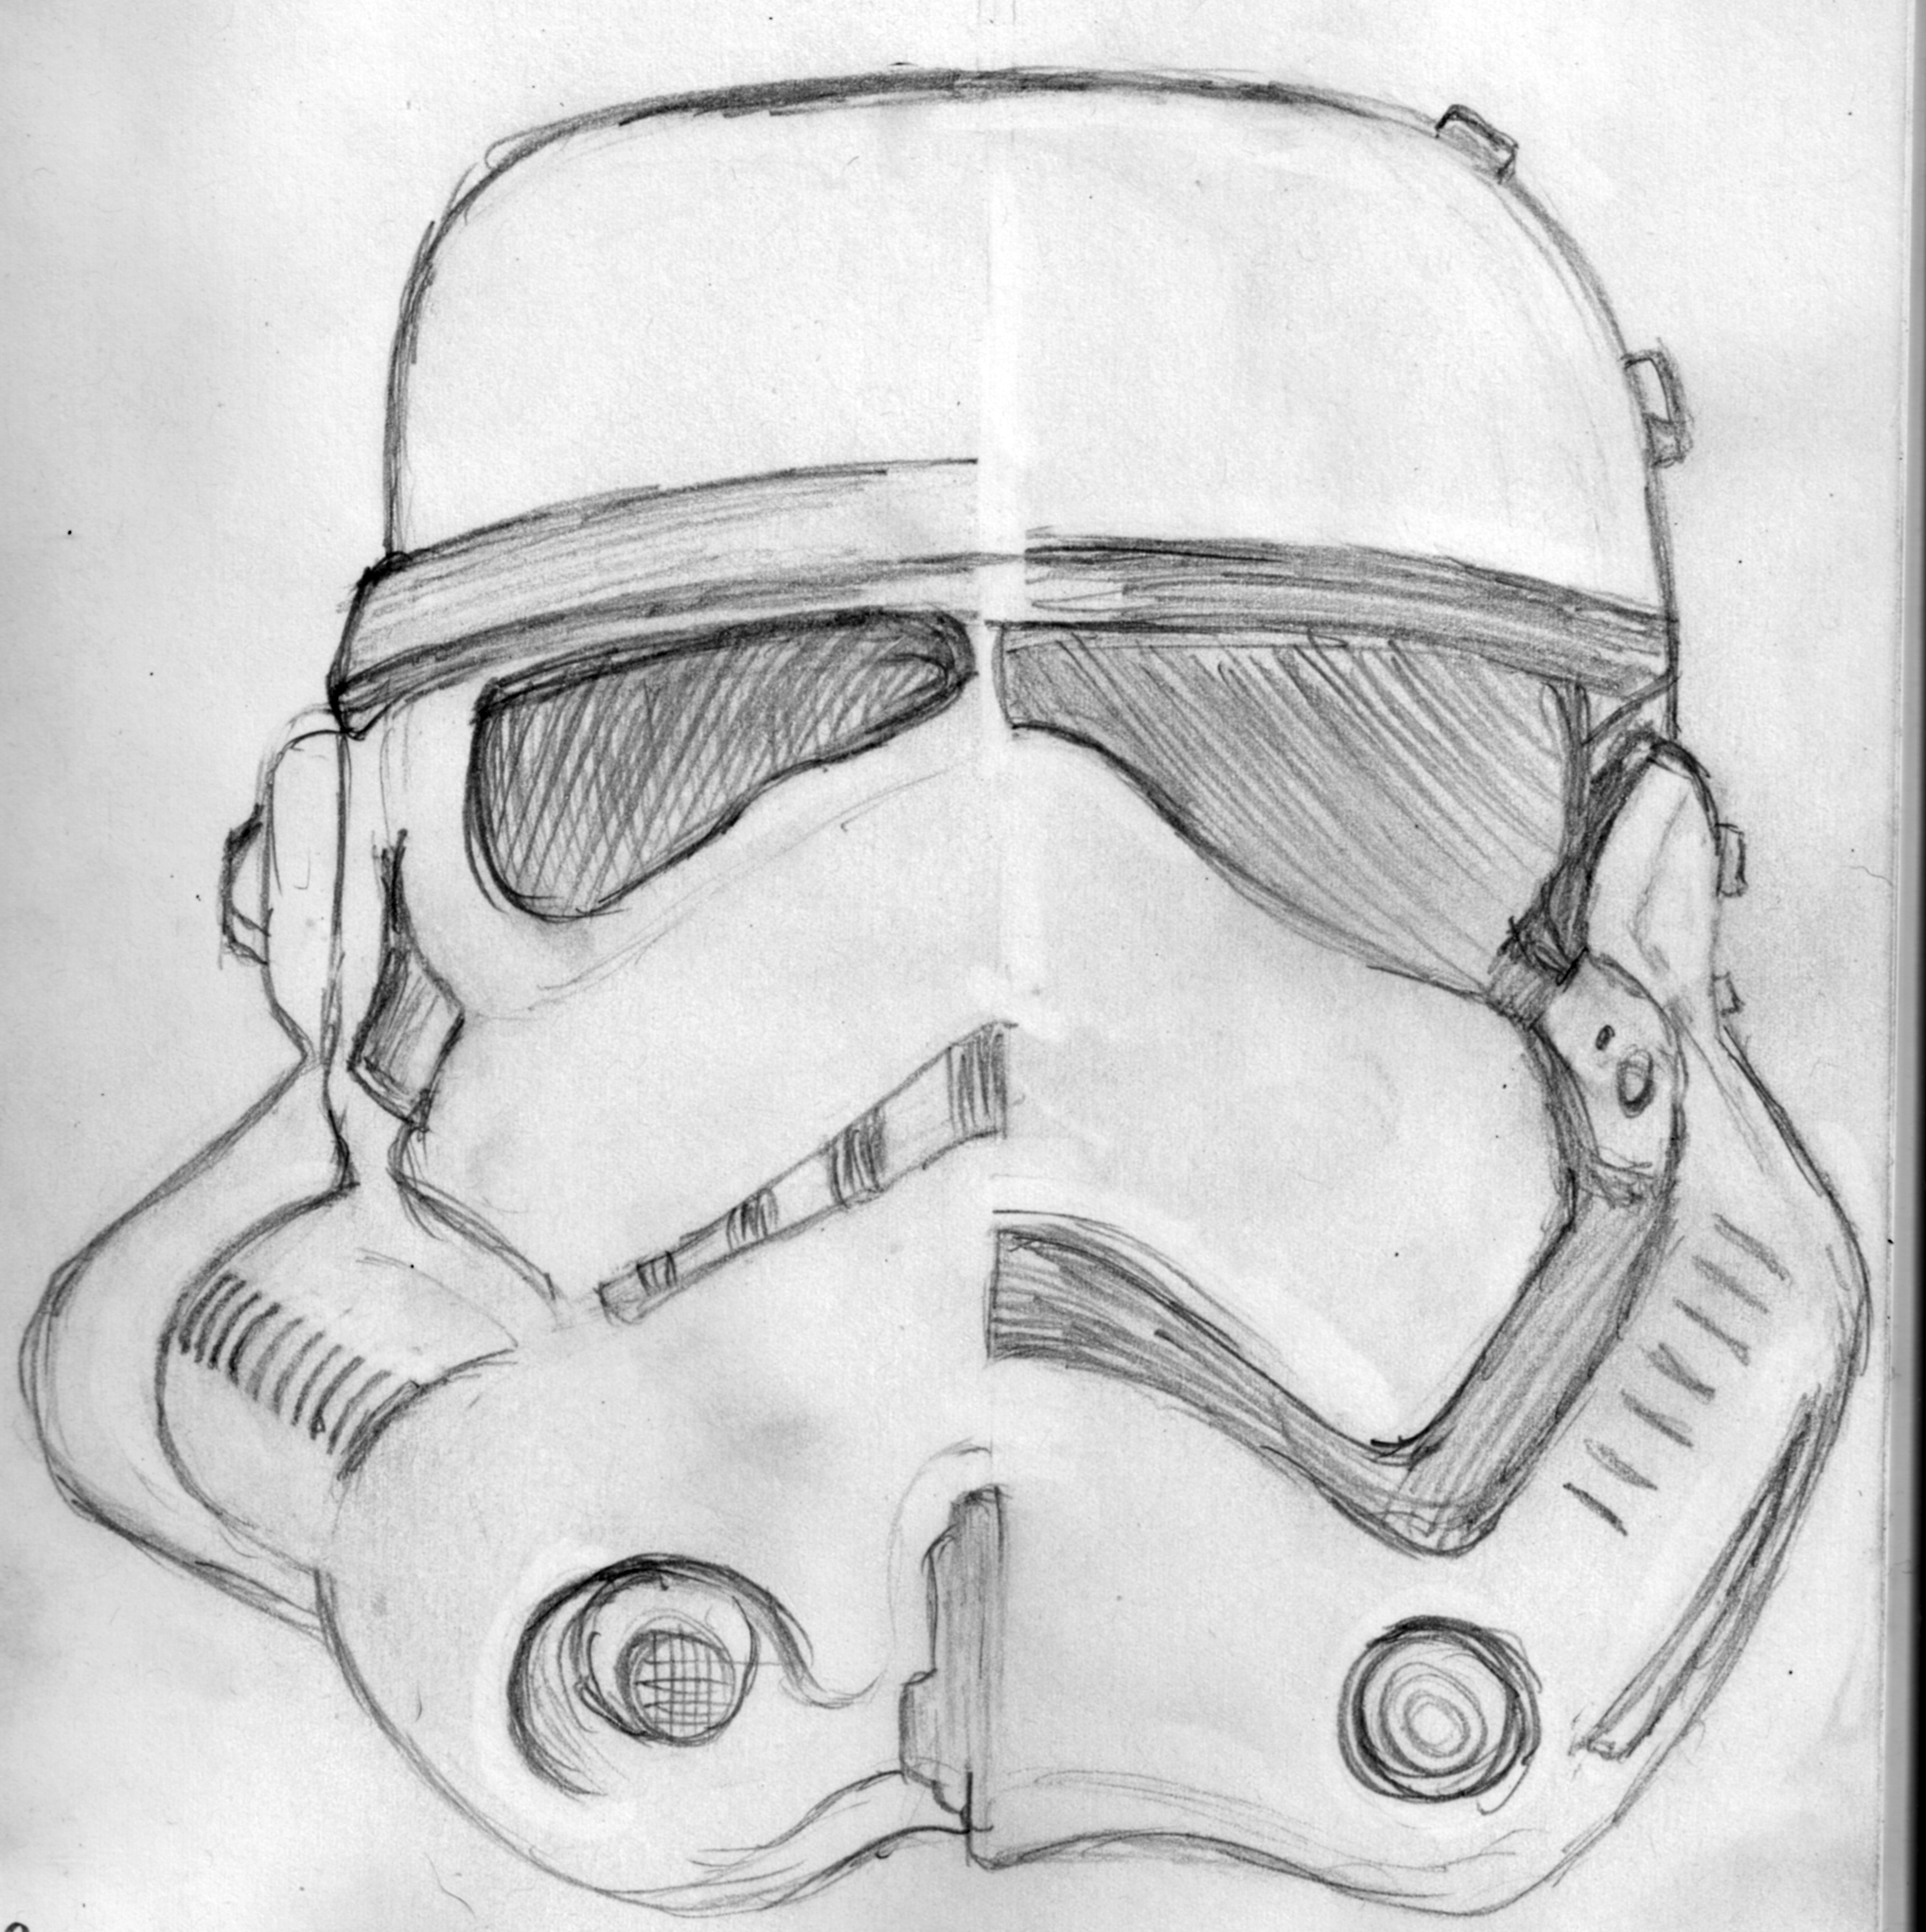 Stormtrooper New and Old Sketch Jlane Design